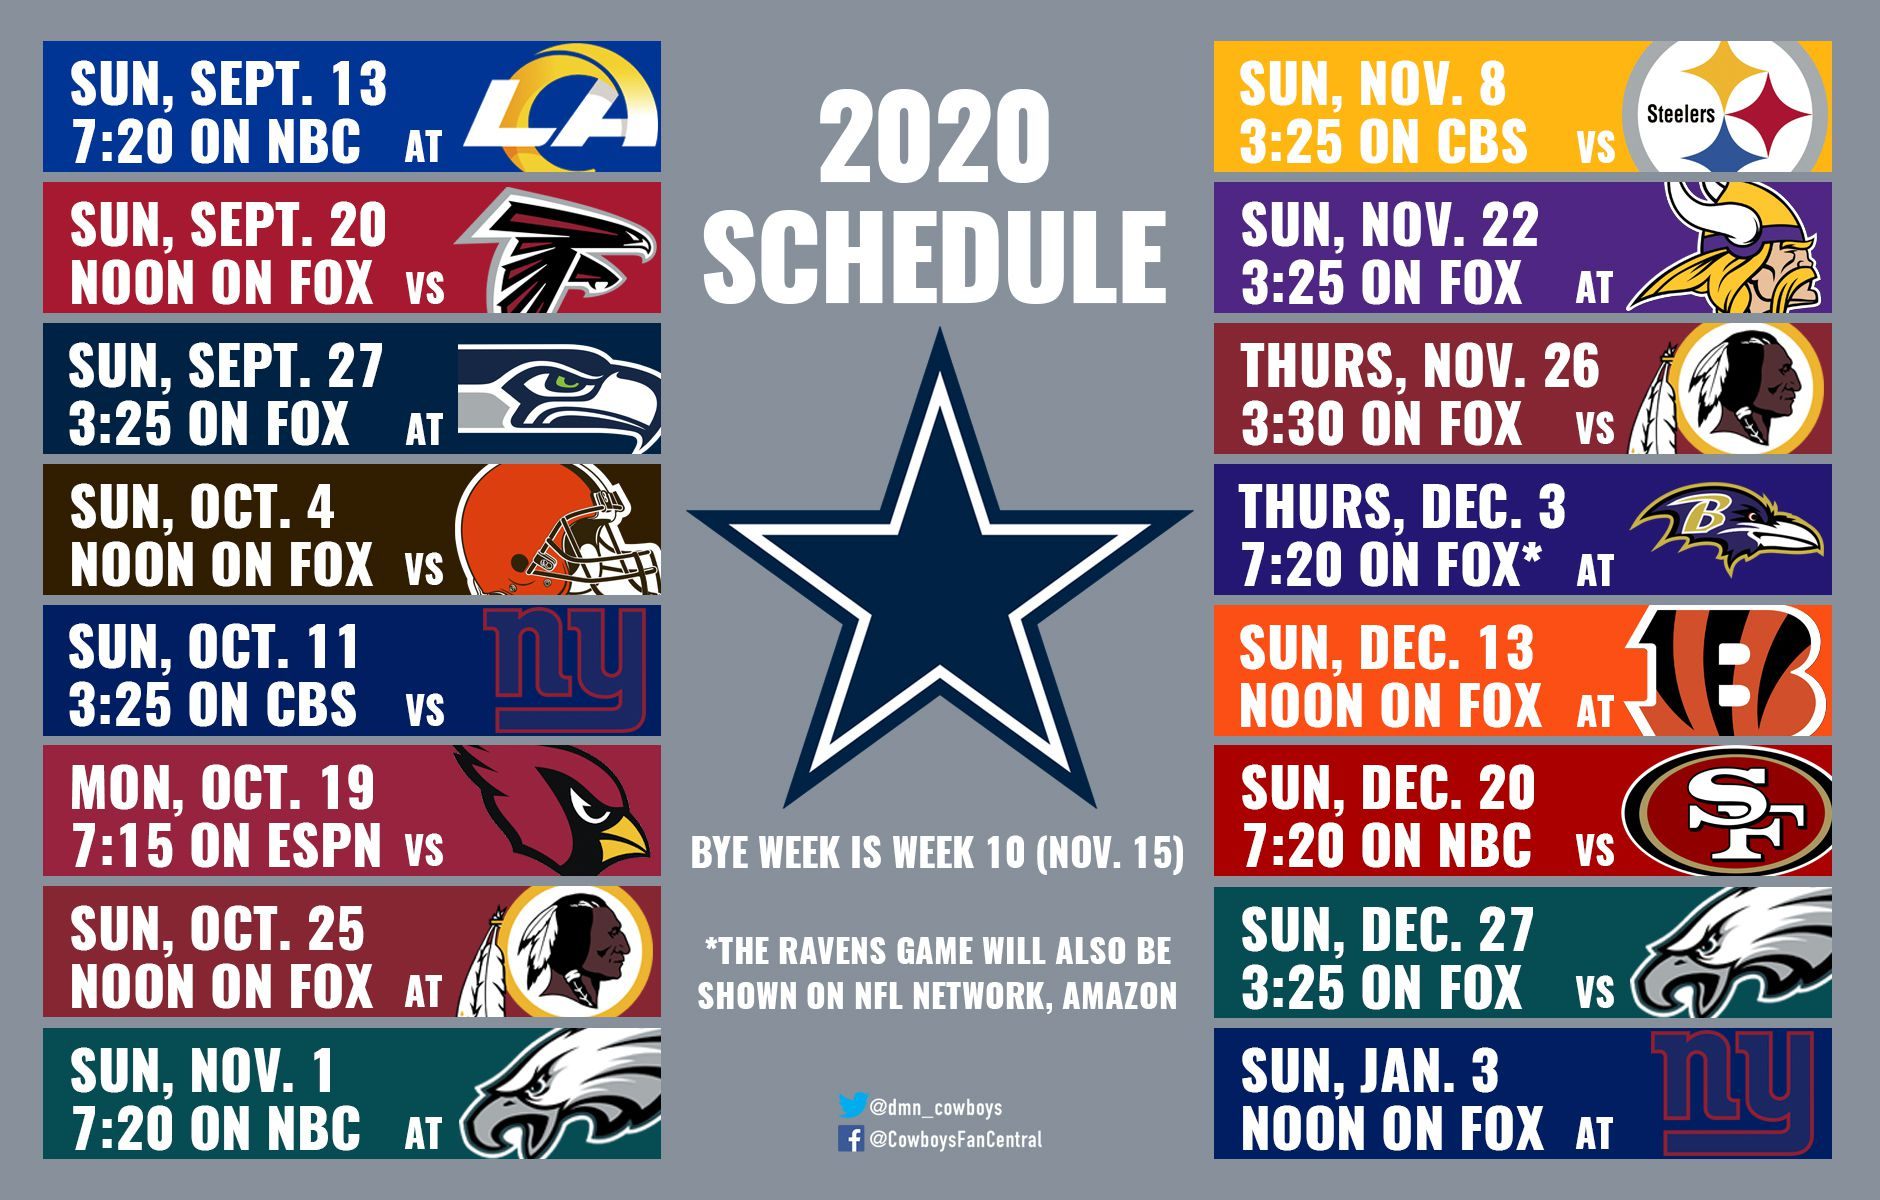 Dallas Cowboys Offseason Central: Important Dates, Latest